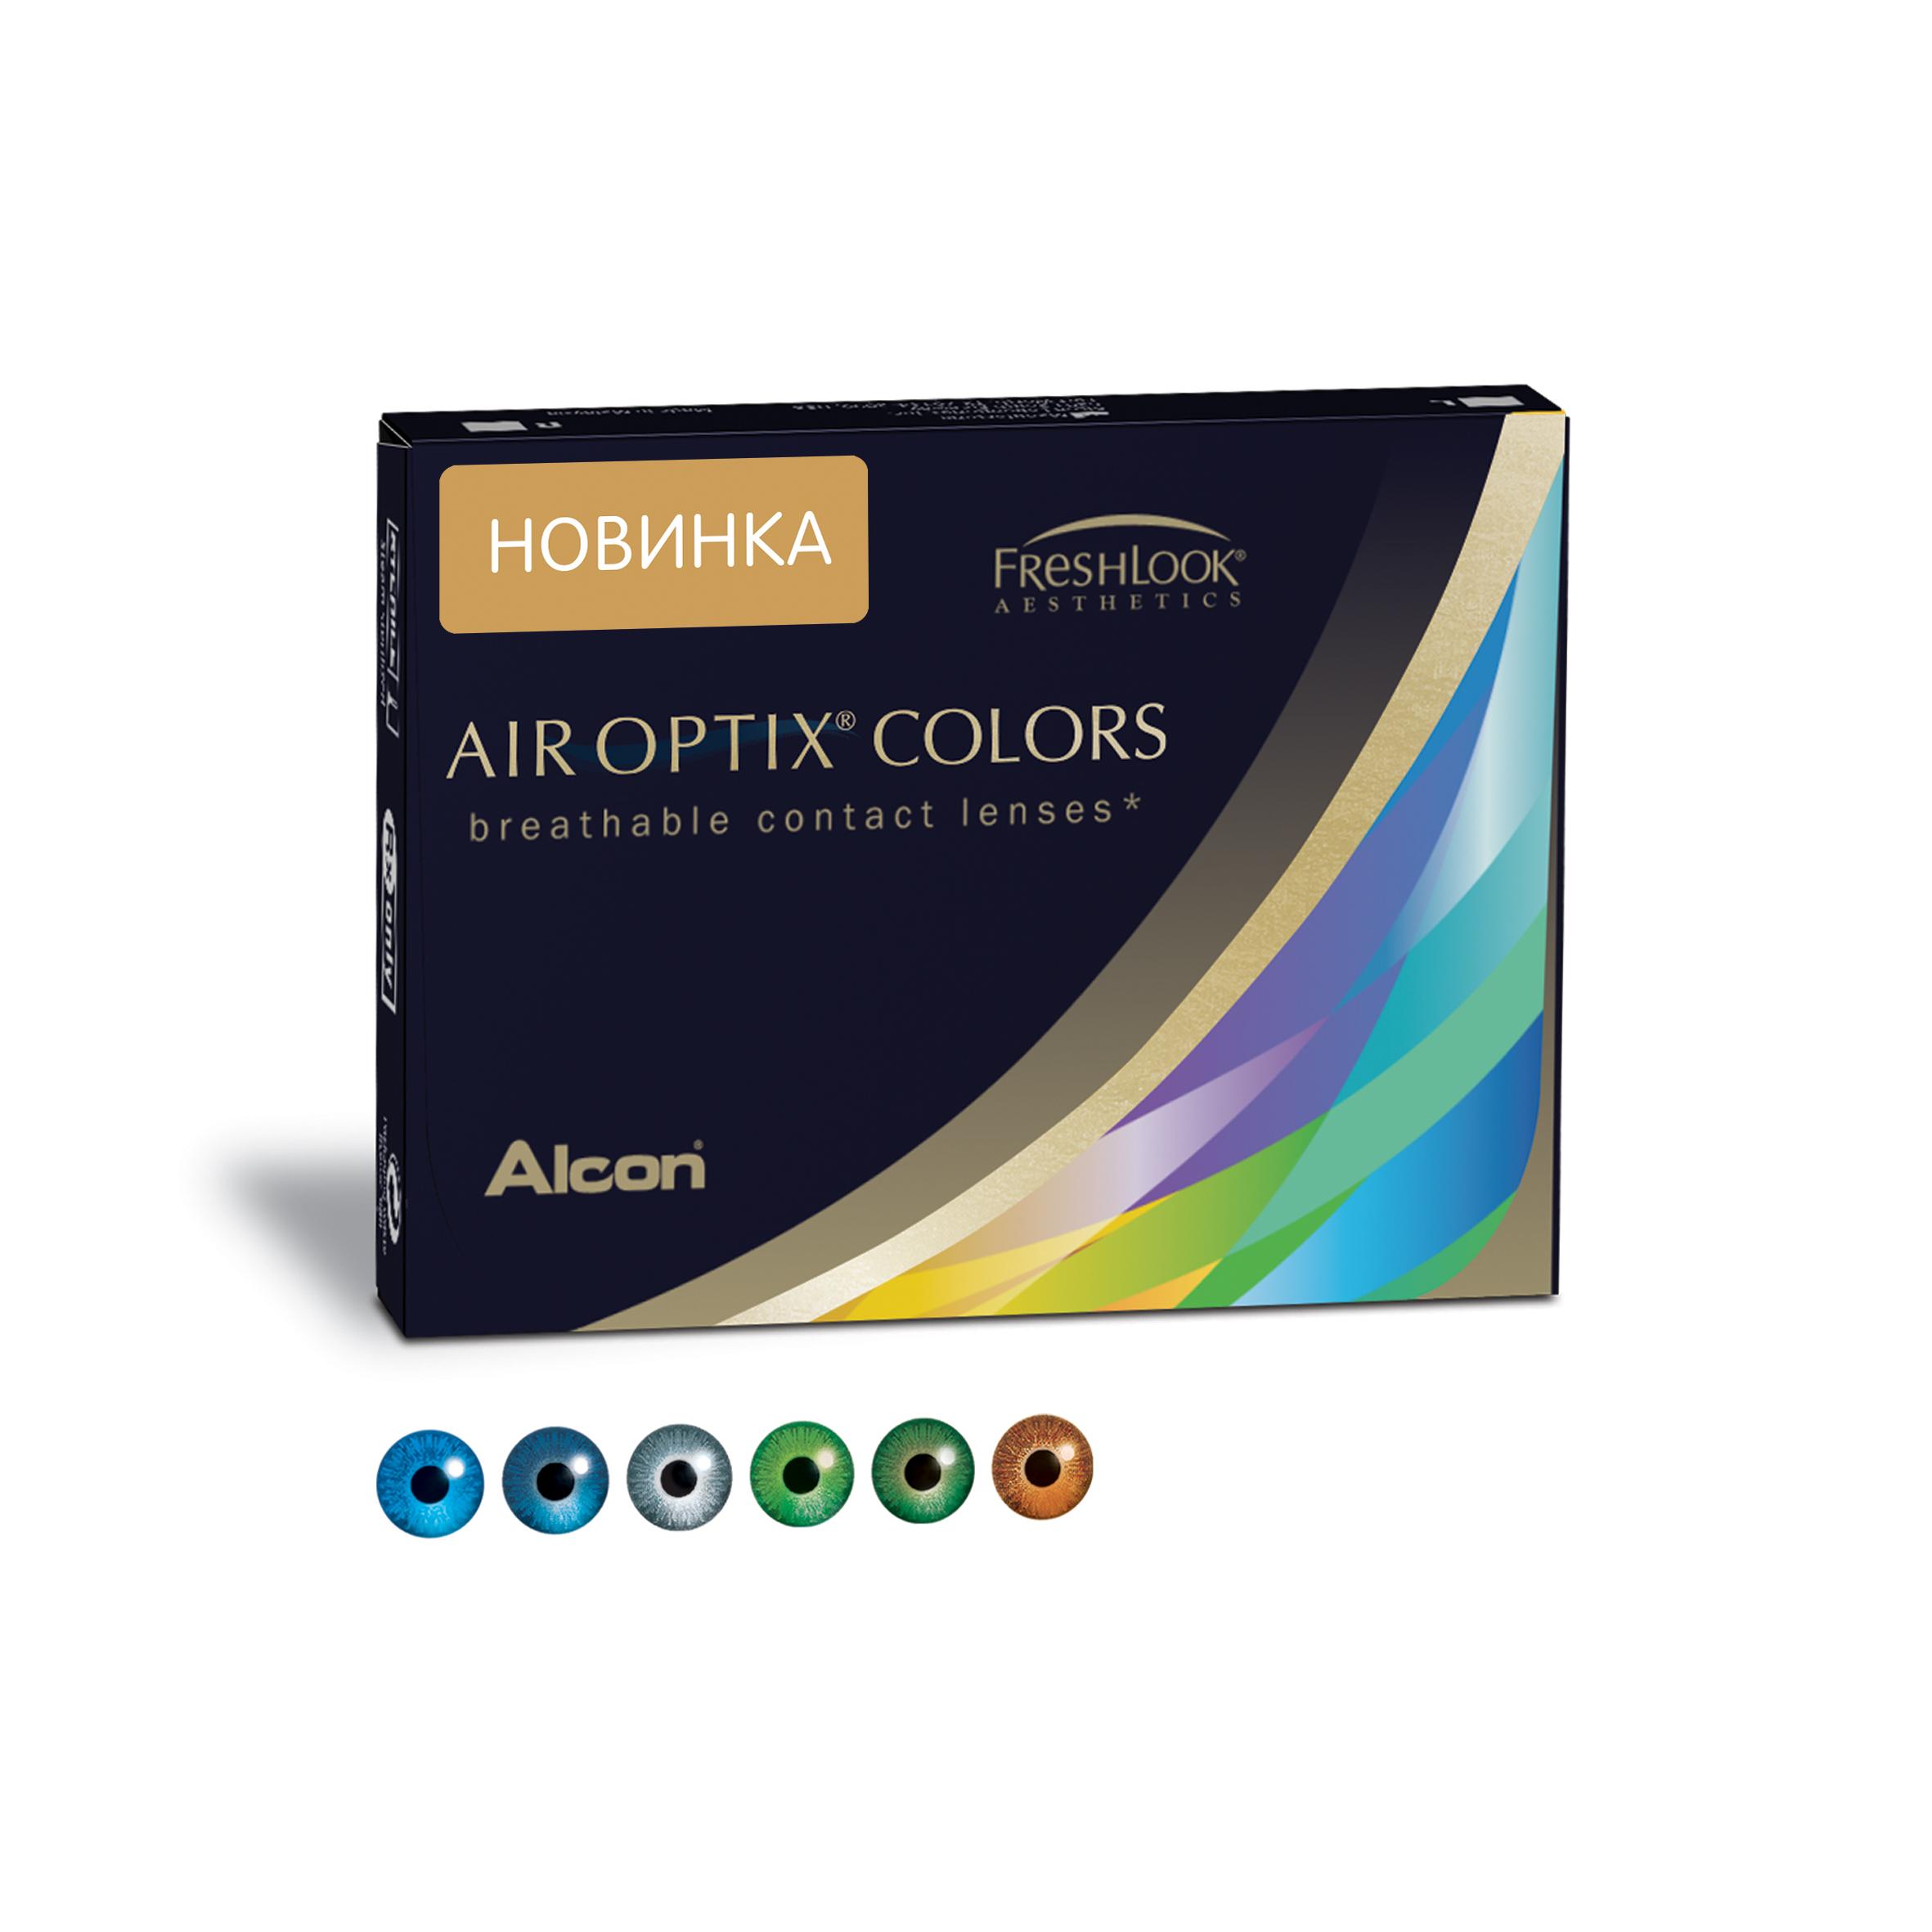 Аlcon контактные линзы Air Optix Colors 2 шт -1.00 Sterling Gray31746129Мягкие контактные линзы